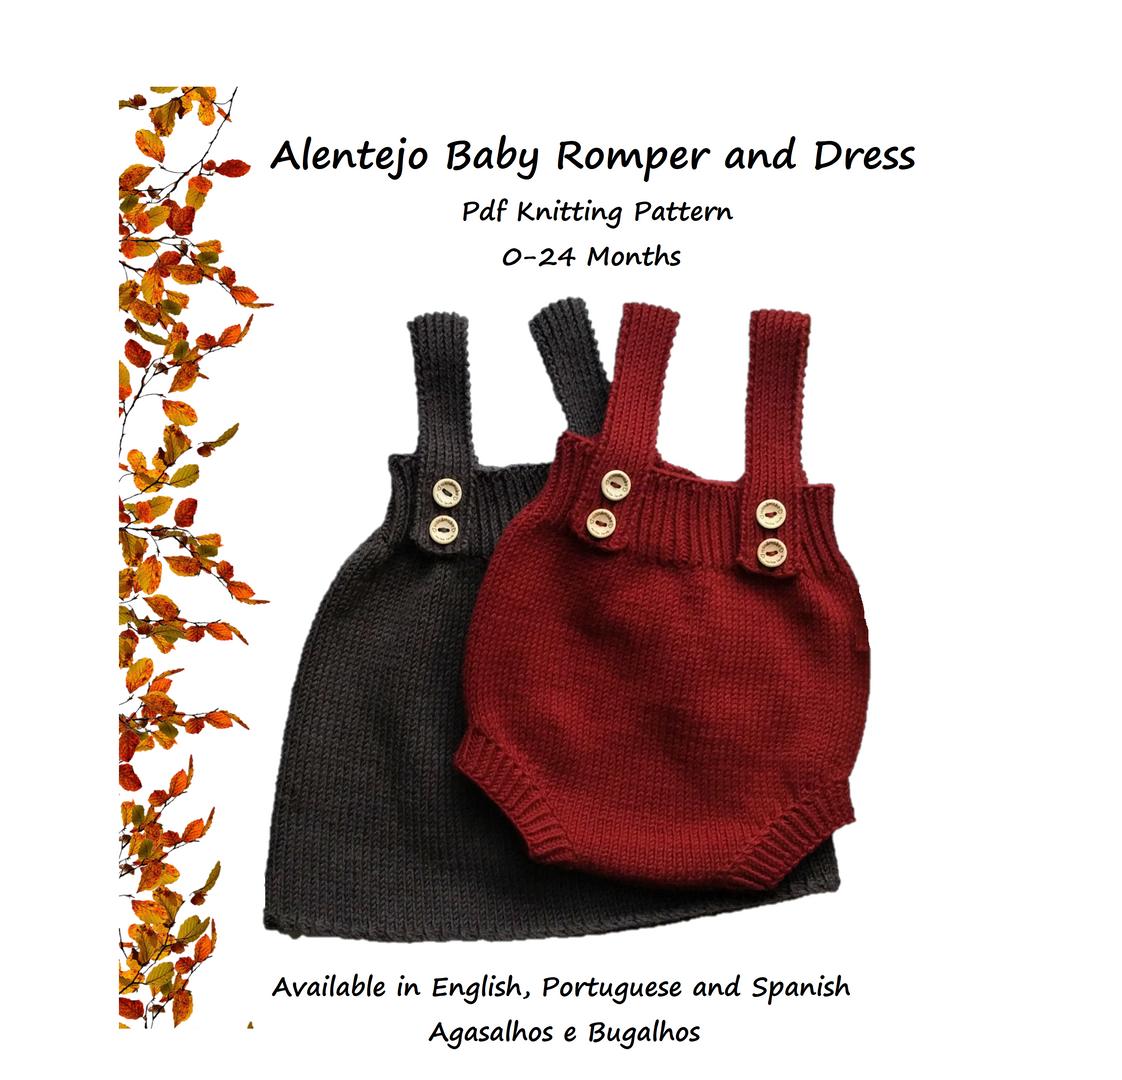 Alentejo Baby Romper and Dress Pdf Knitting Pattern